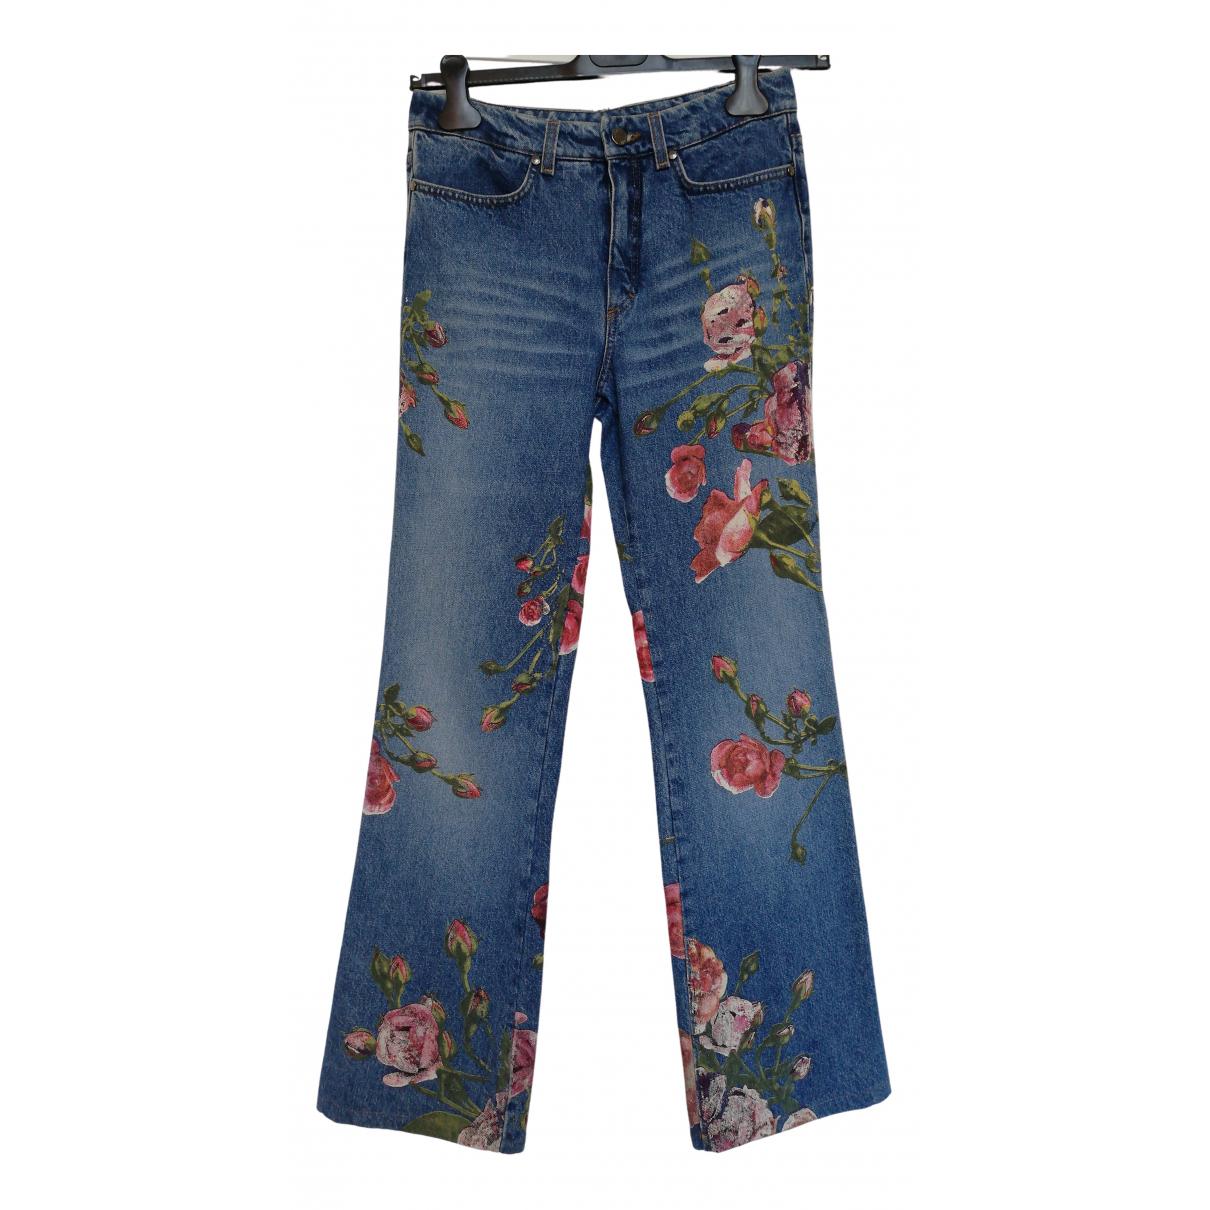 Roberto Cavalli \N Blue Denim - Jeans Trousers for Women S International